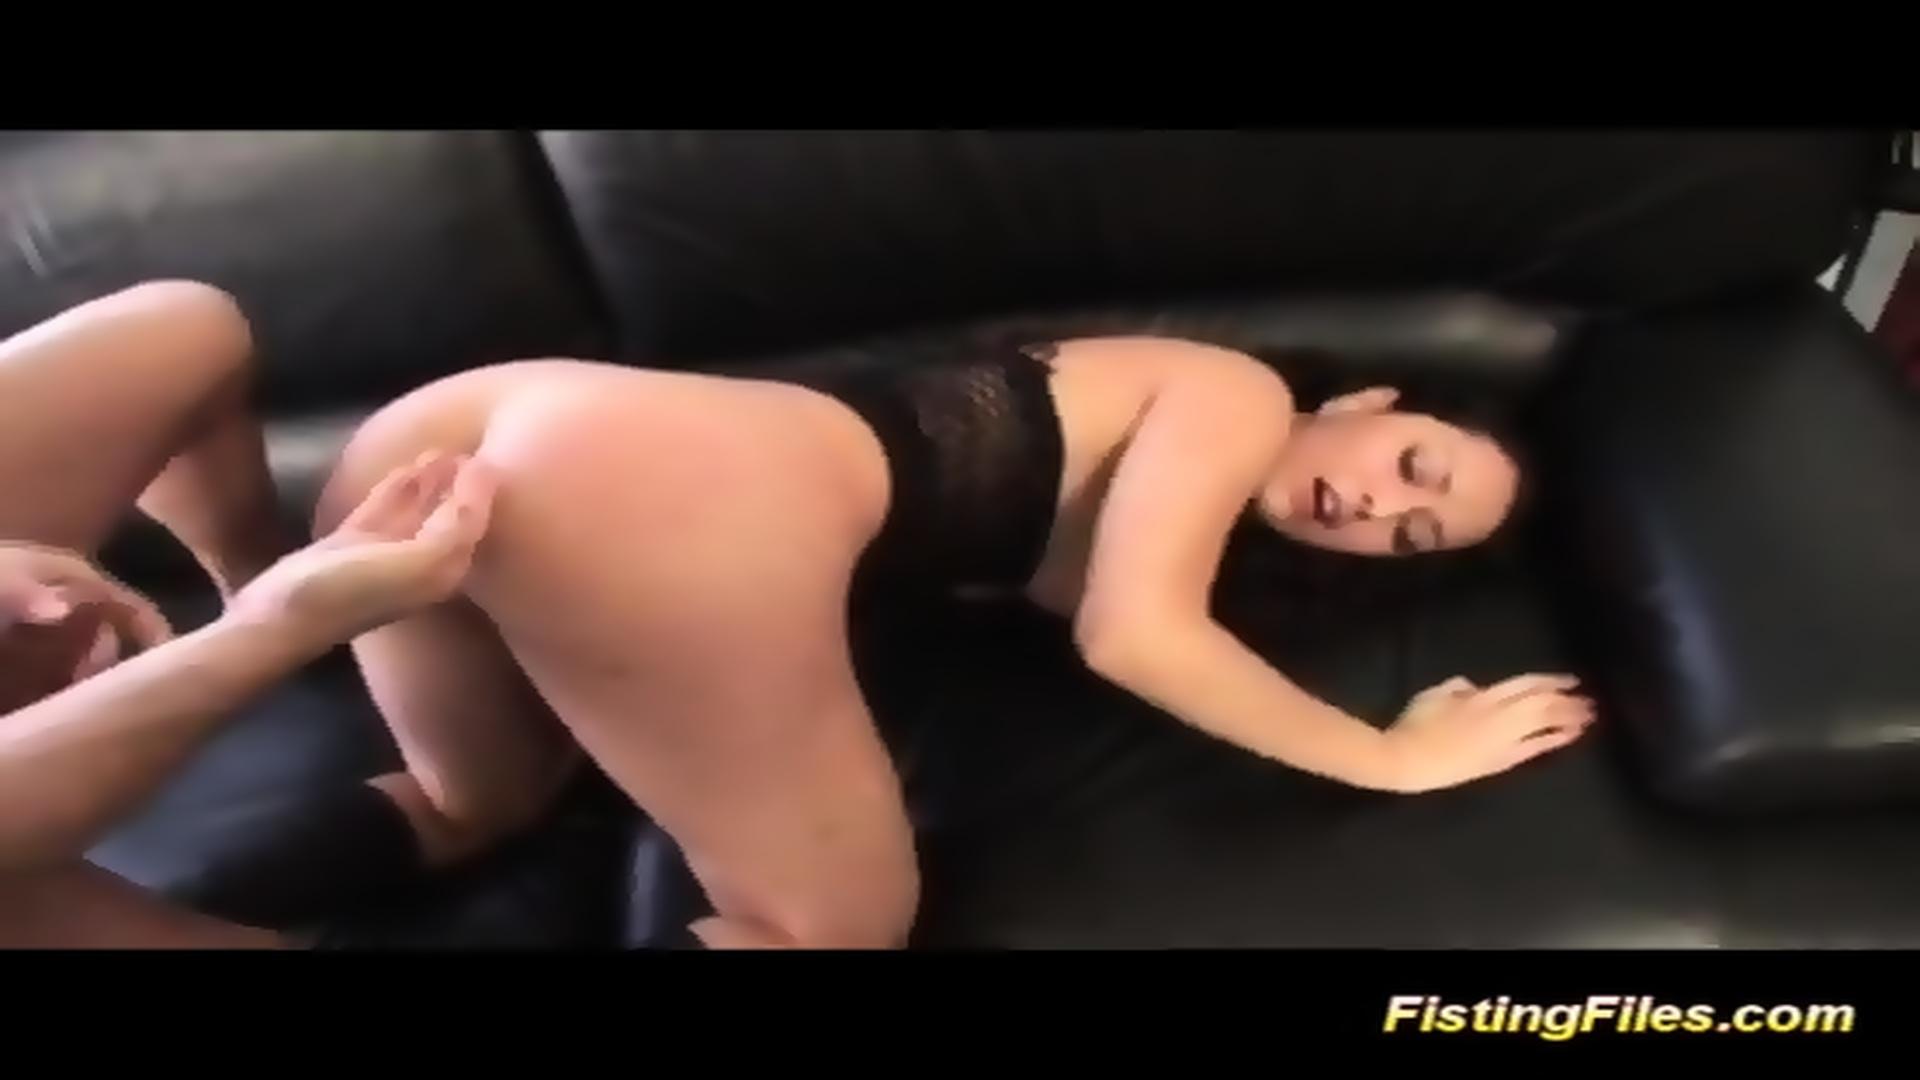 Threesome free video sexy women